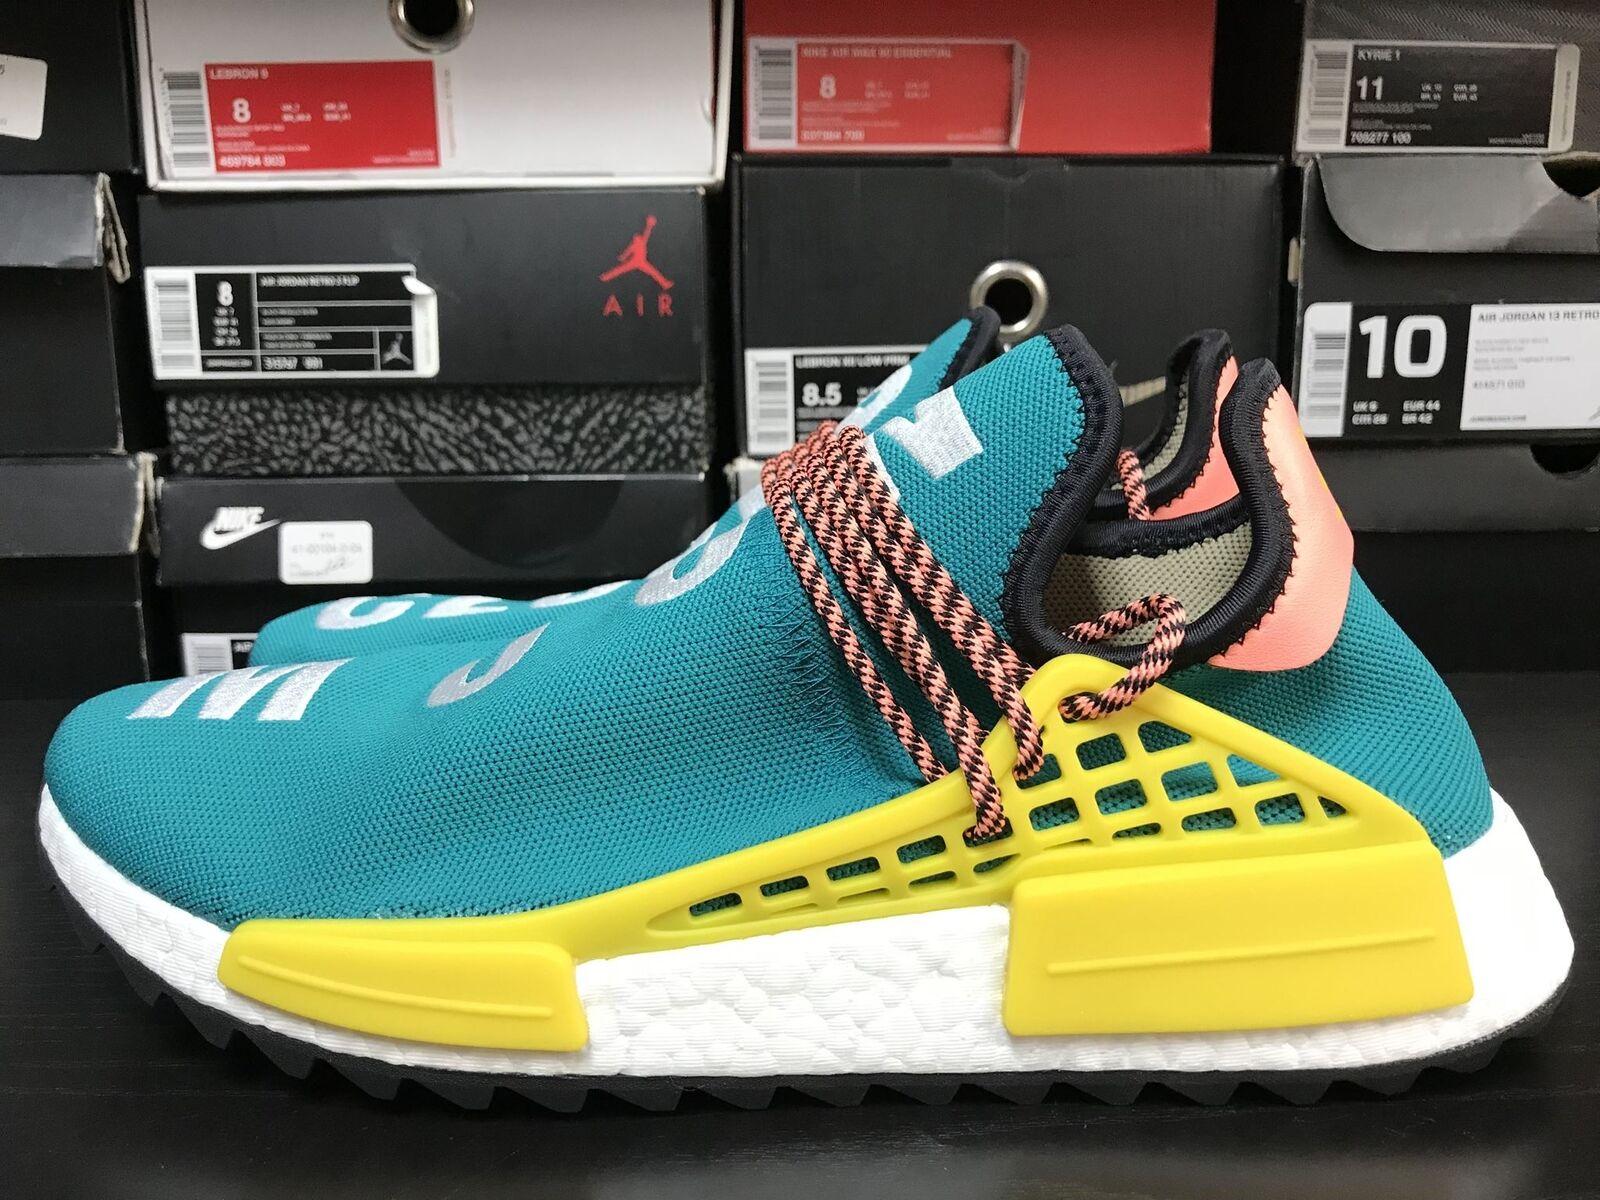 New Adidas Human Race NMD Pharrell Sun Glow Teal AC7188 Boost Size 14